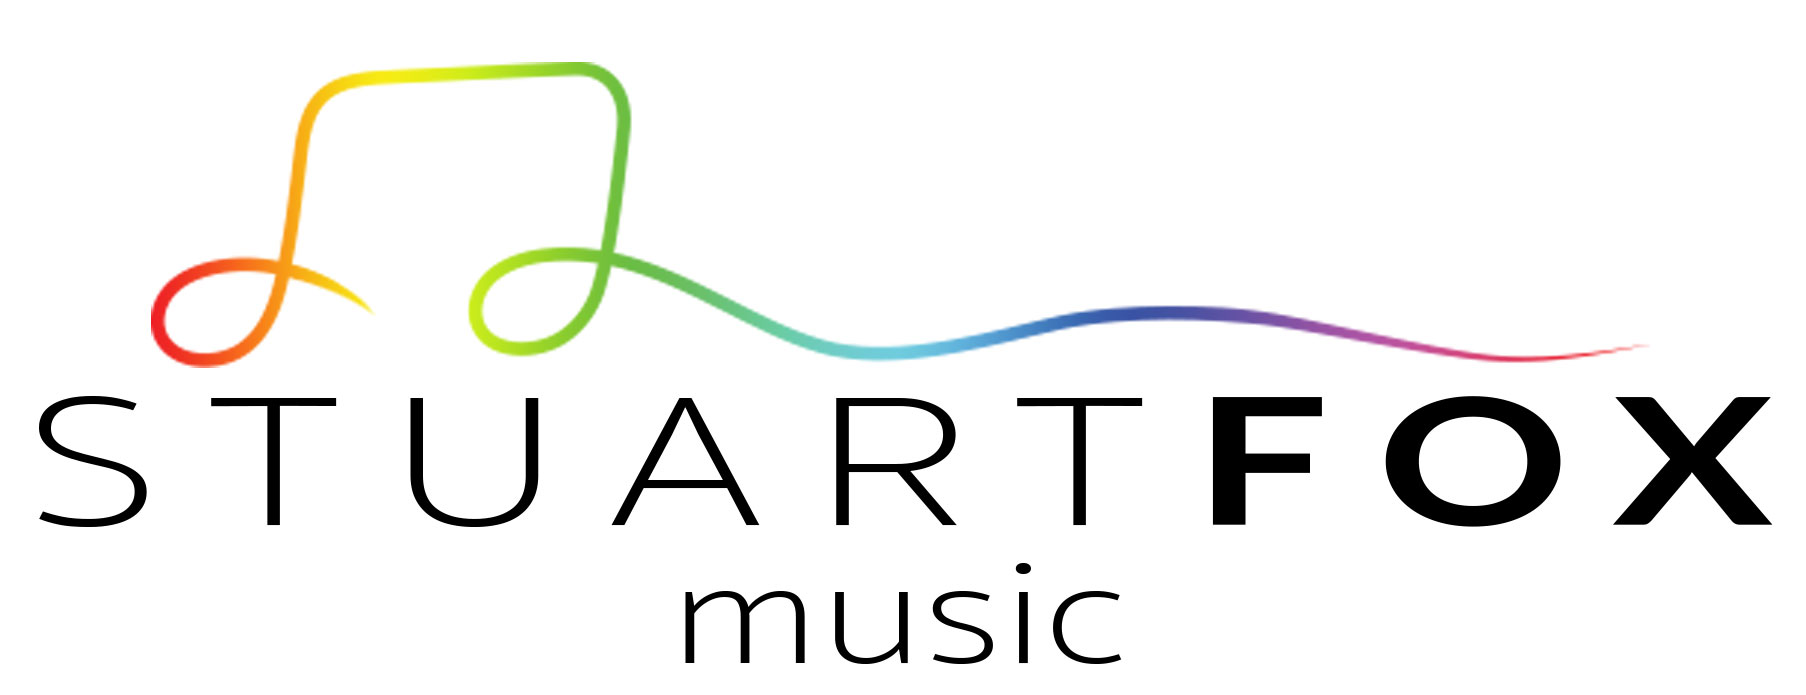 Stuart Fox Music - Original music composed for TV and Film